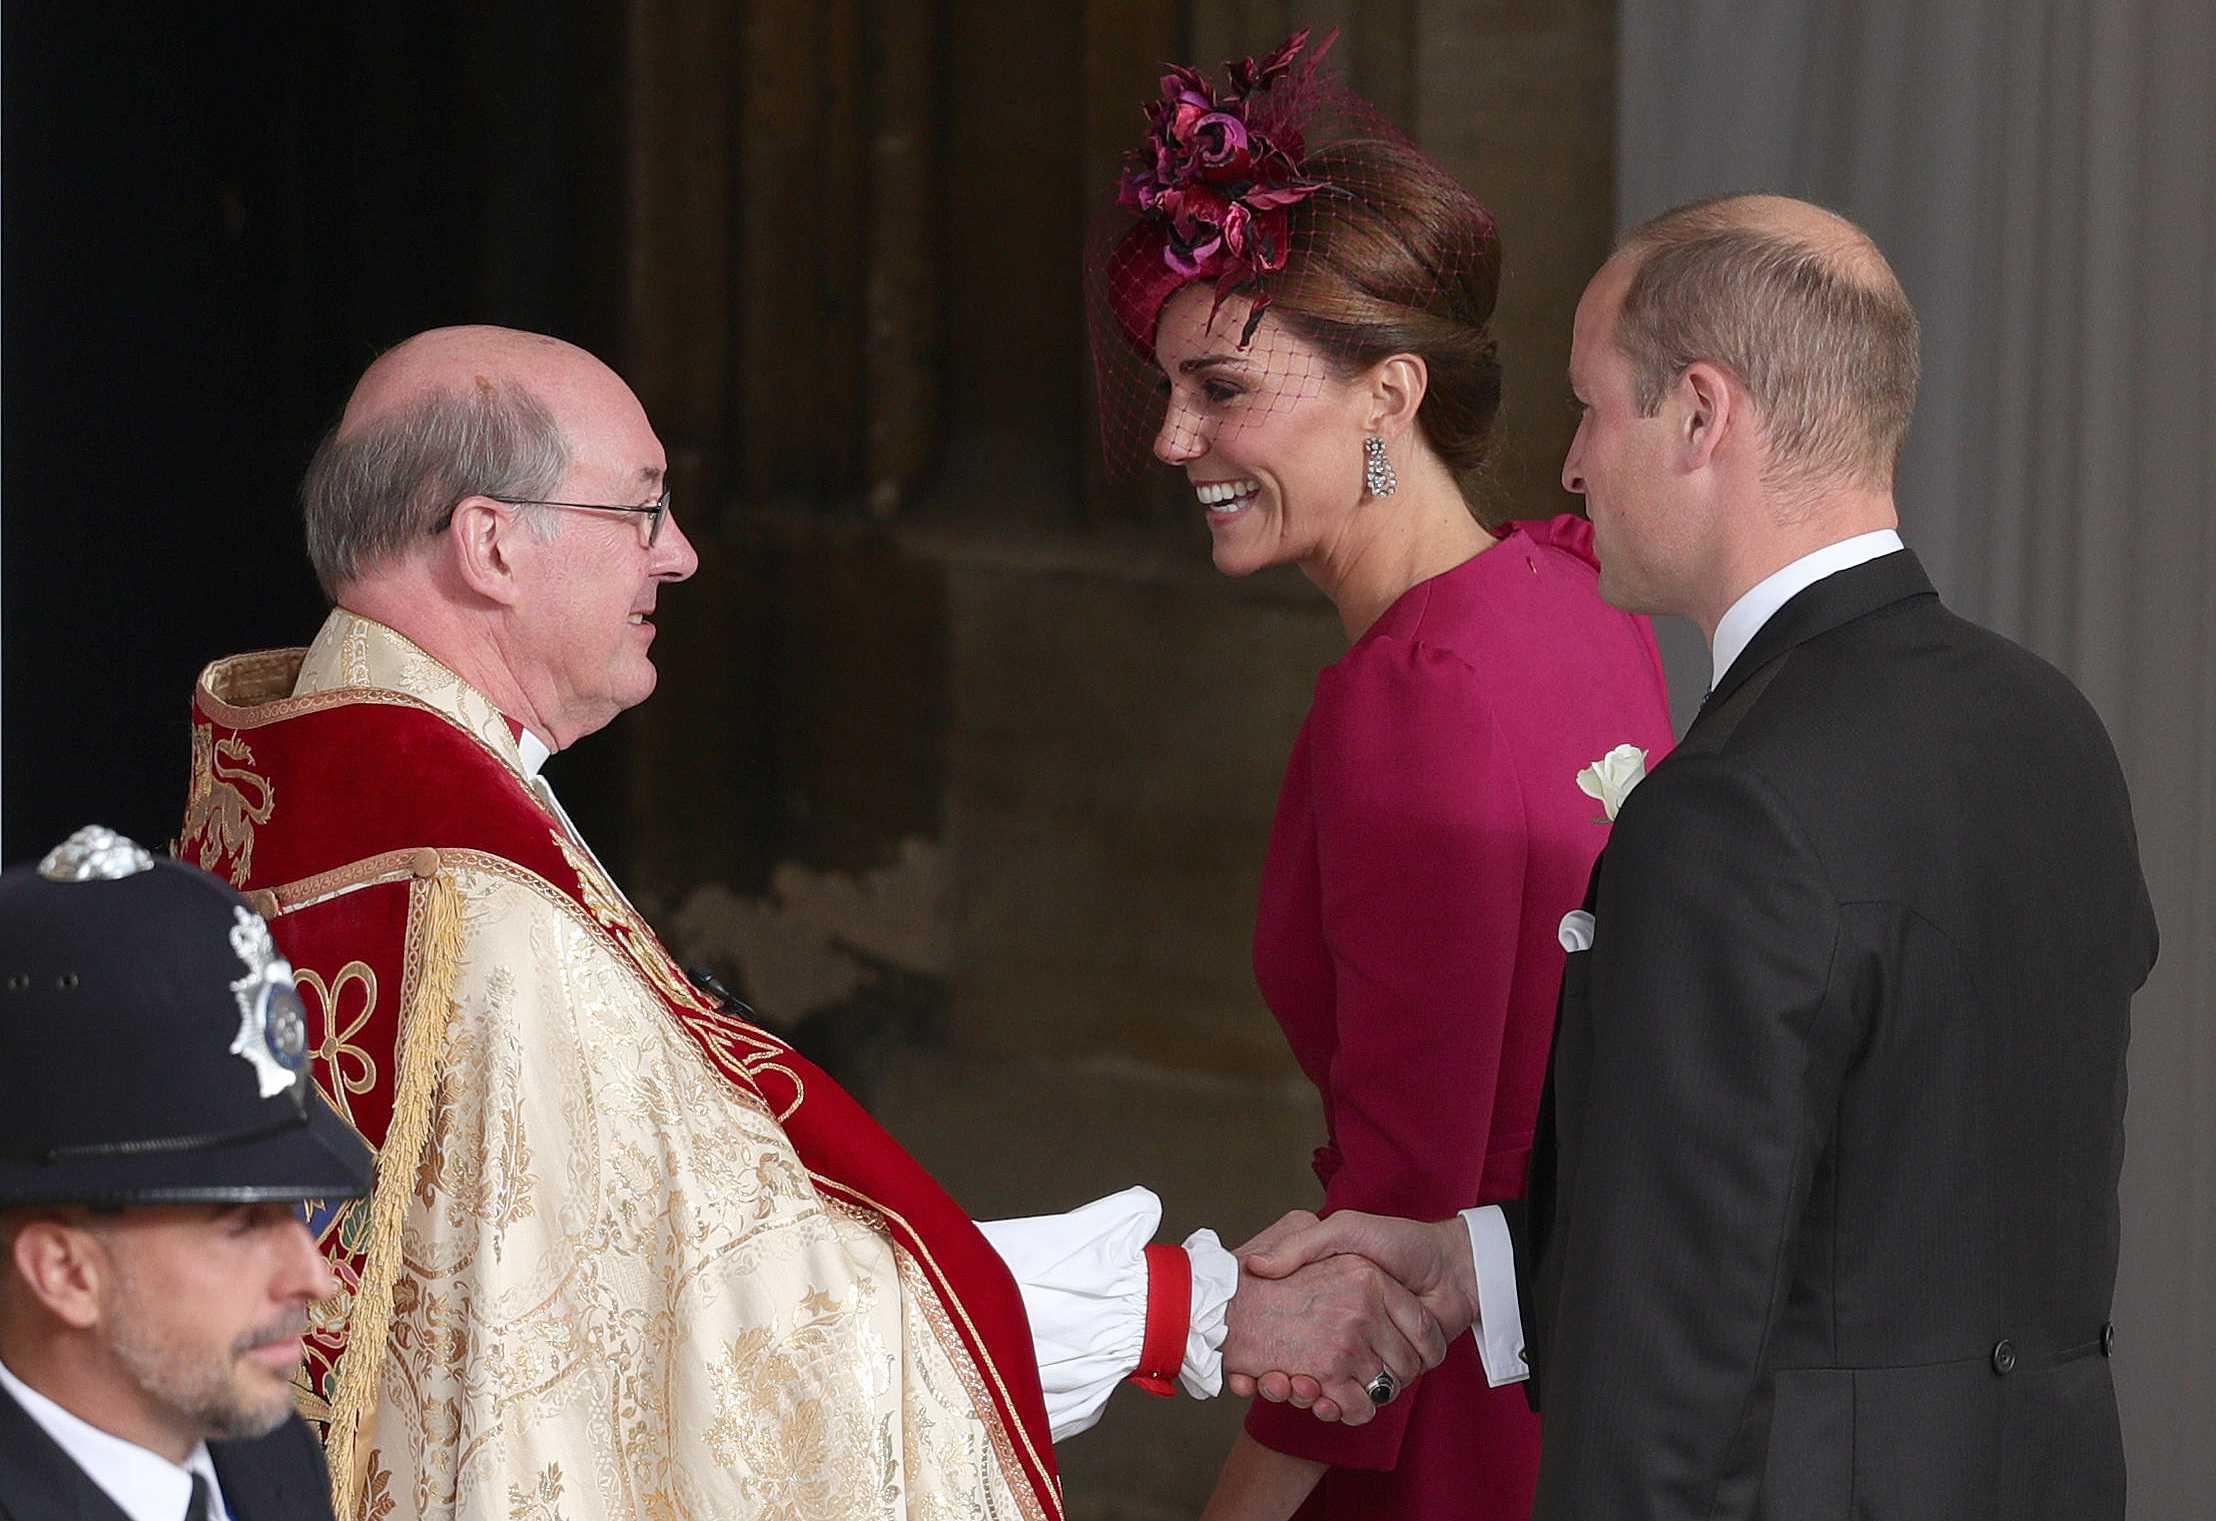 Princess Eugenie Jack Brooksbank Wedding Kate and William